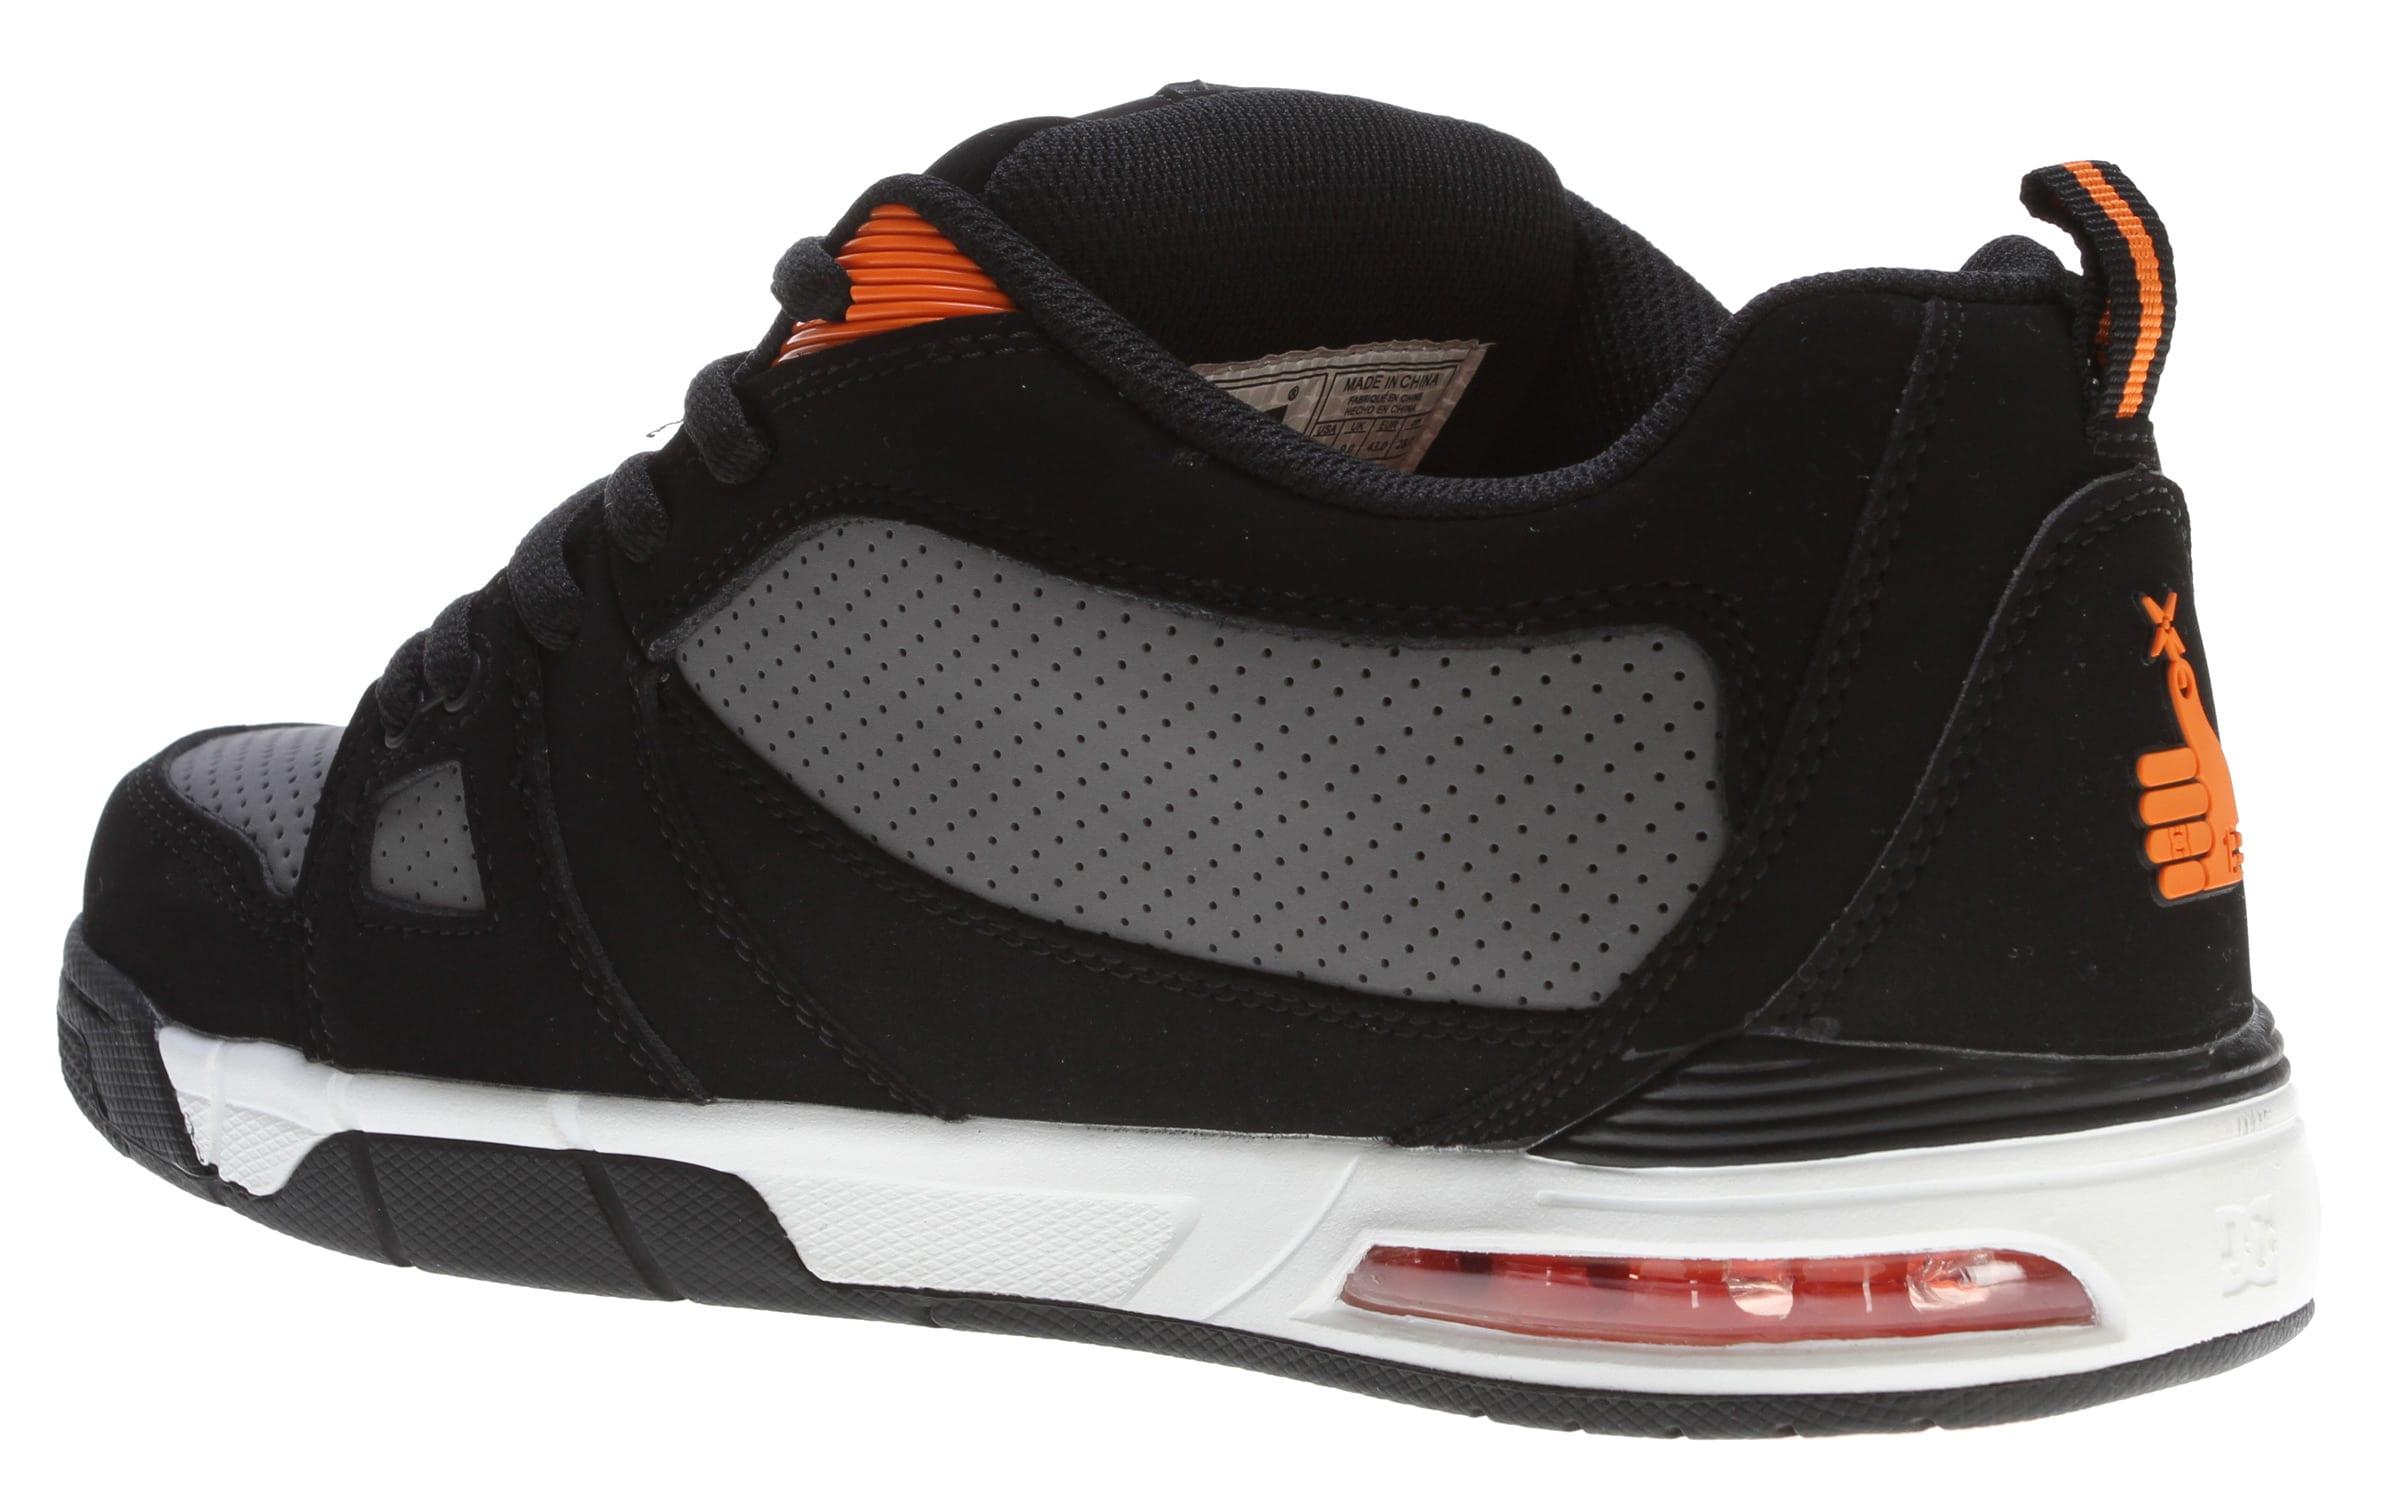 wholesale dealer 9b85a a3102 DC Frenzy TP Skate Shoes - thumbnail 3